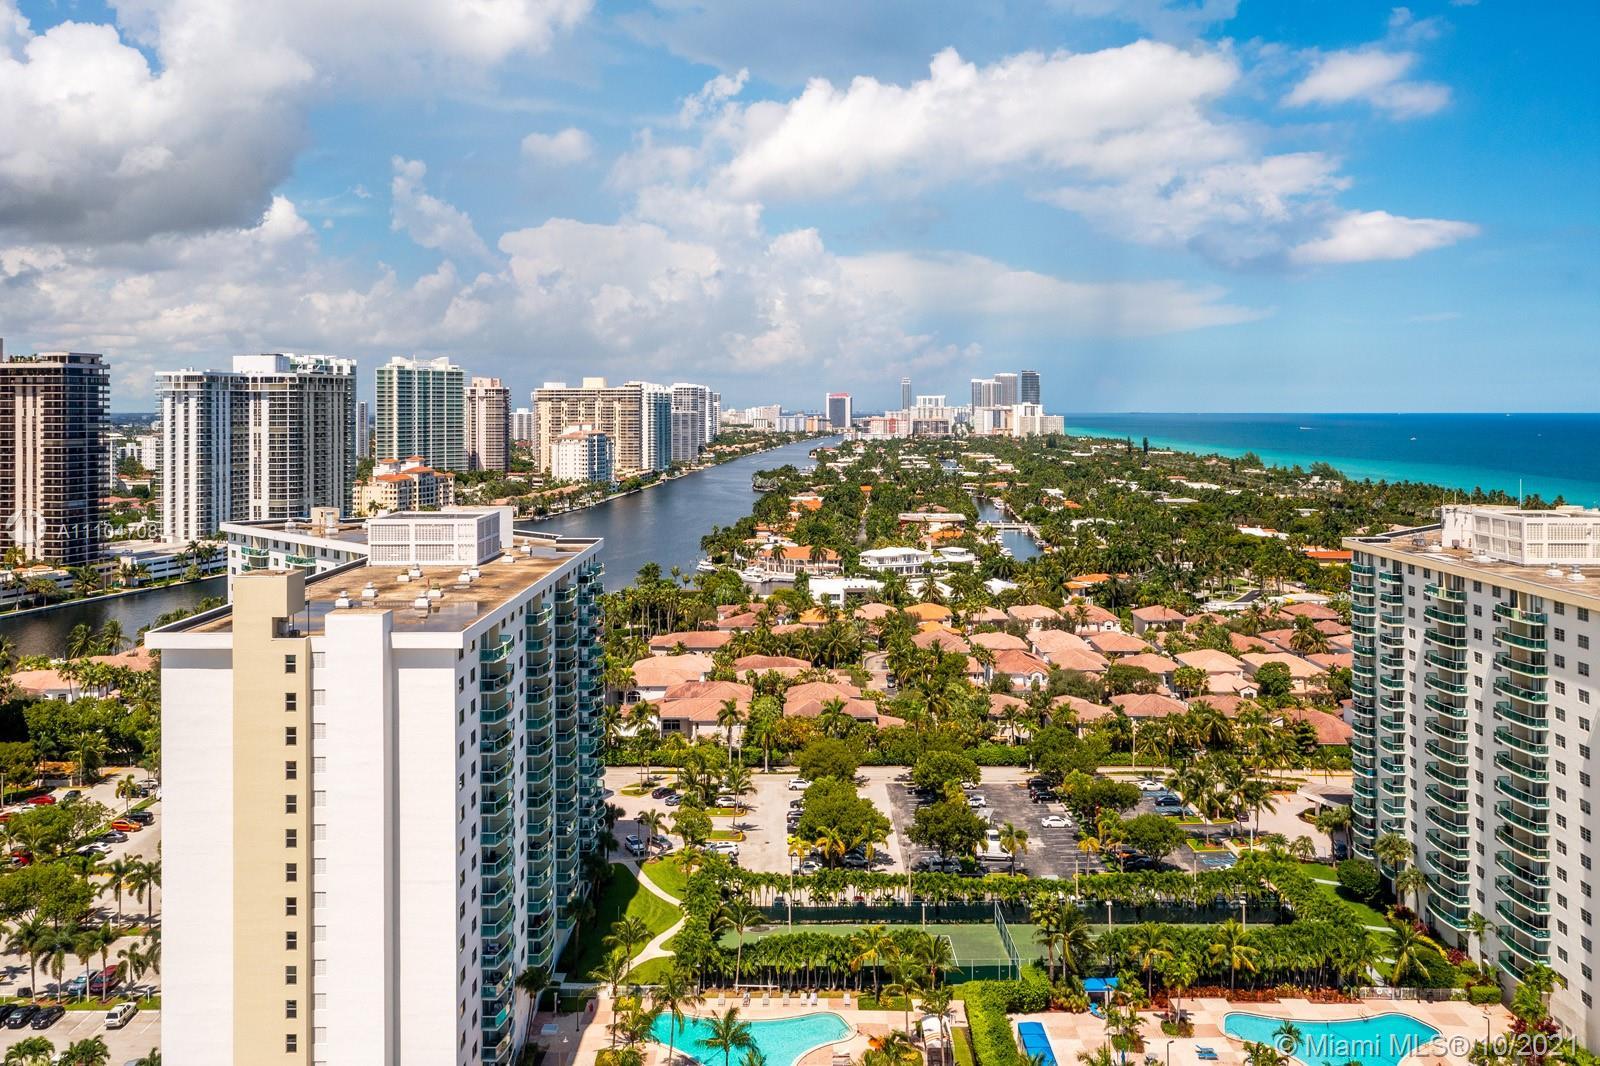 Ocean View A #1412 - 19390 Collins Ave #1412, Sunny Isles Beach, FL 33160